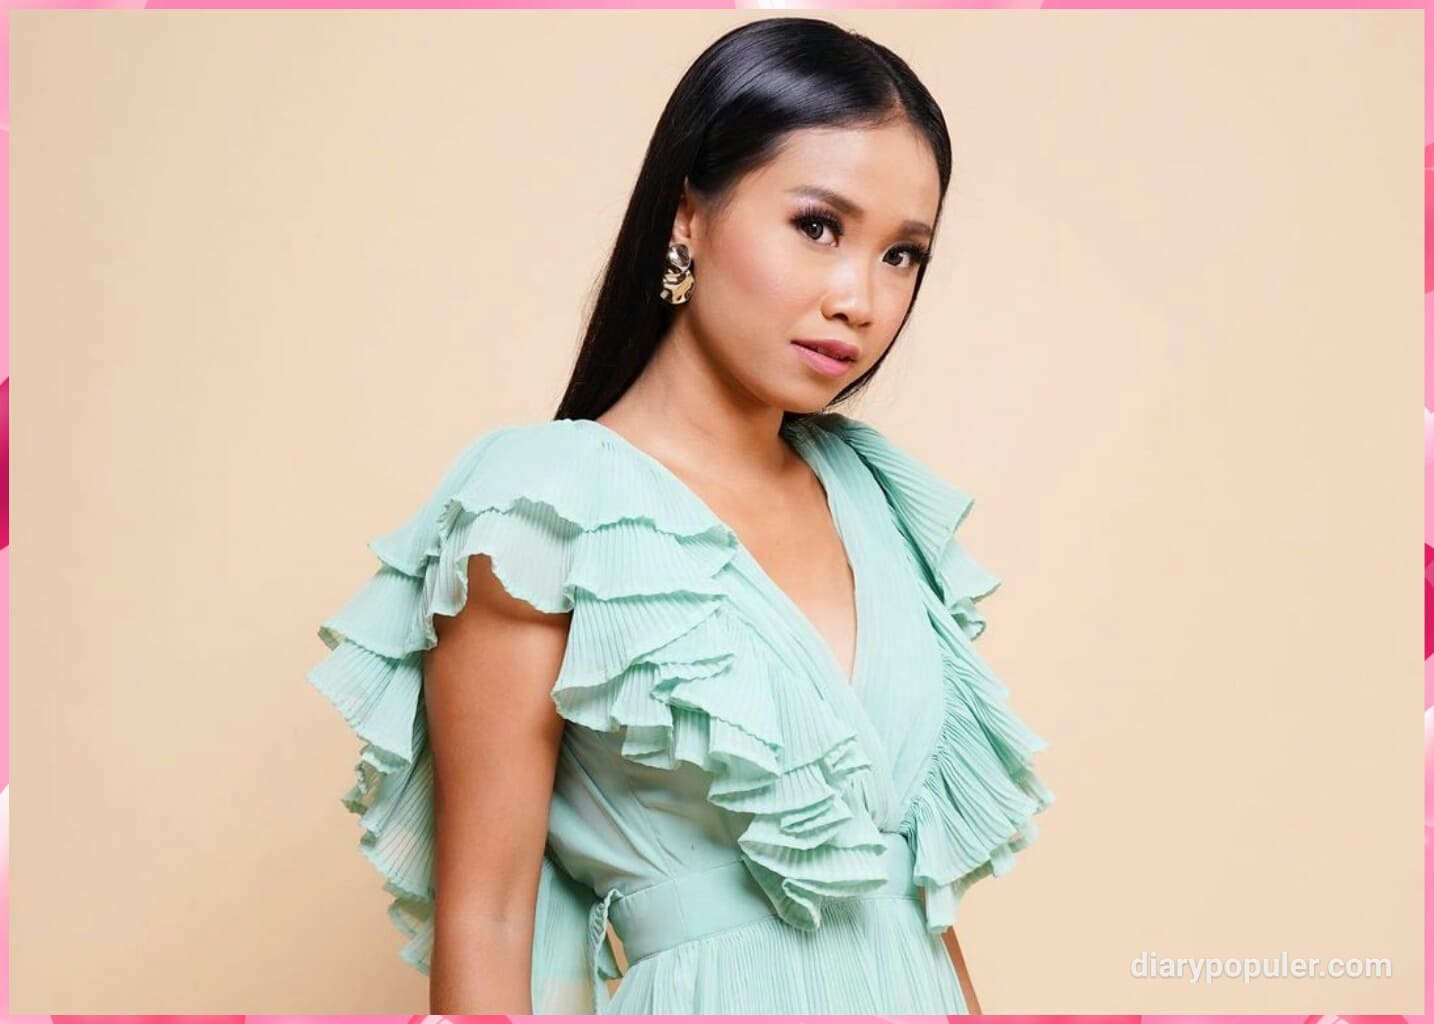 Biodata Glenca Chysara Ikatan Cinta Public Figure Photo